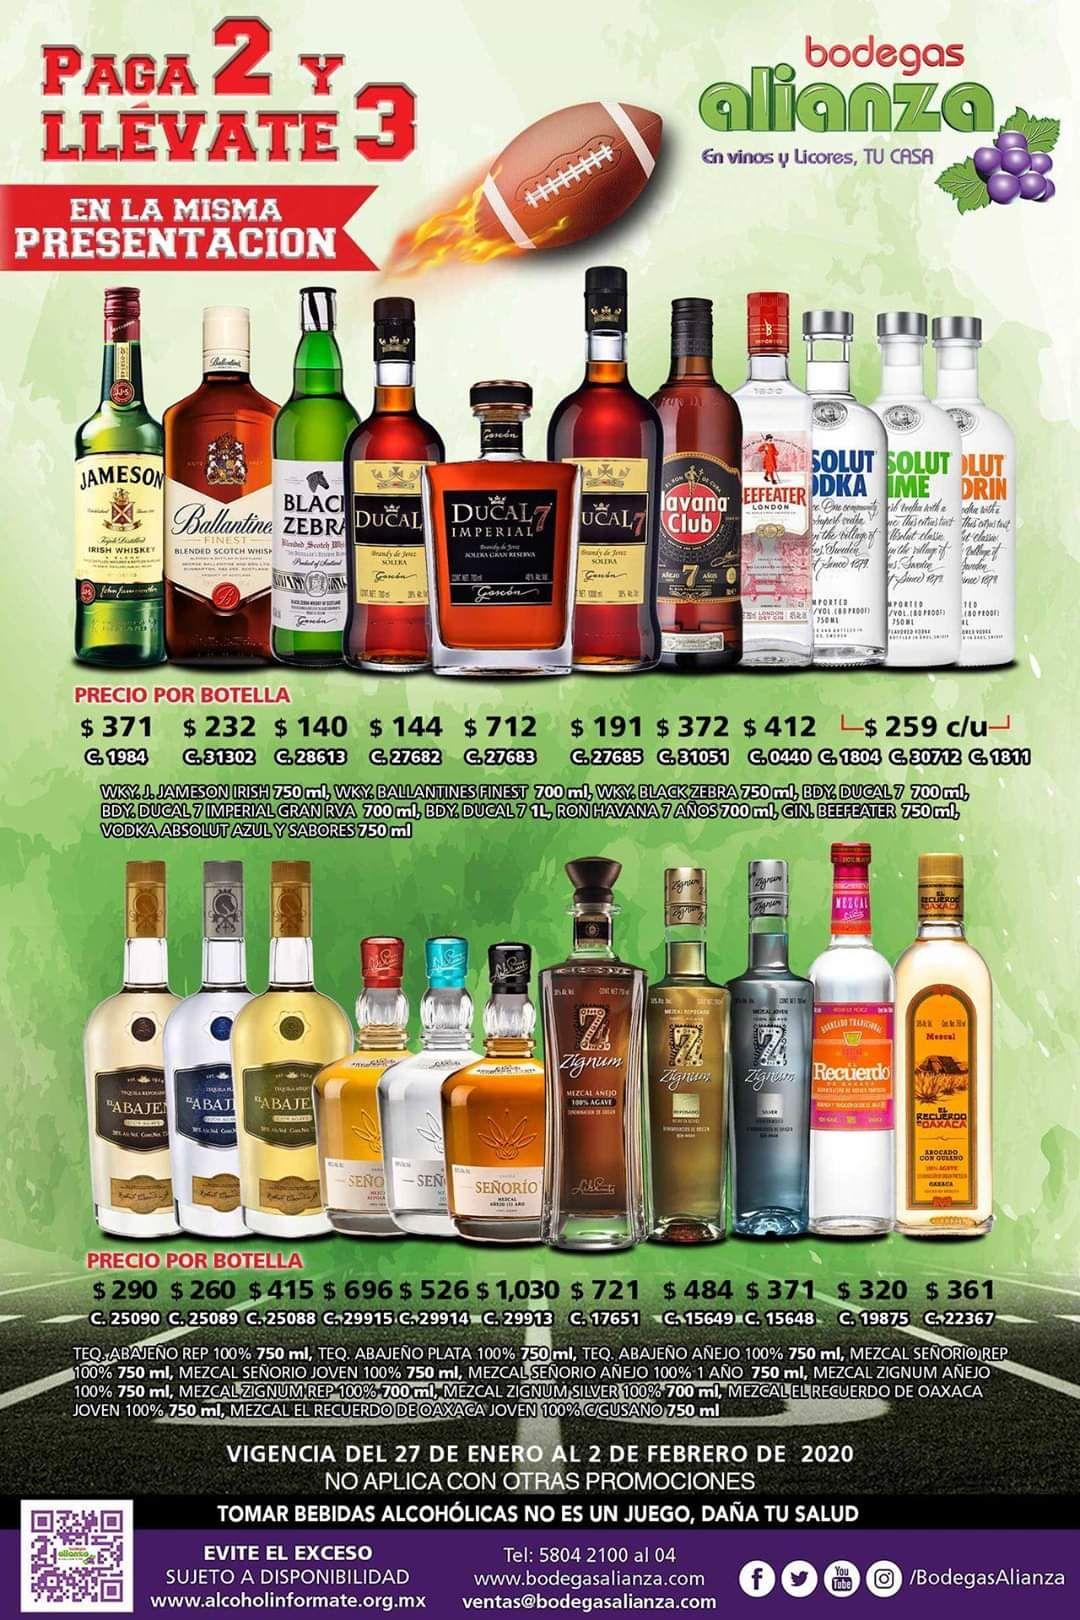 Bodegas Alianza: 3 x 2 en varias botellas